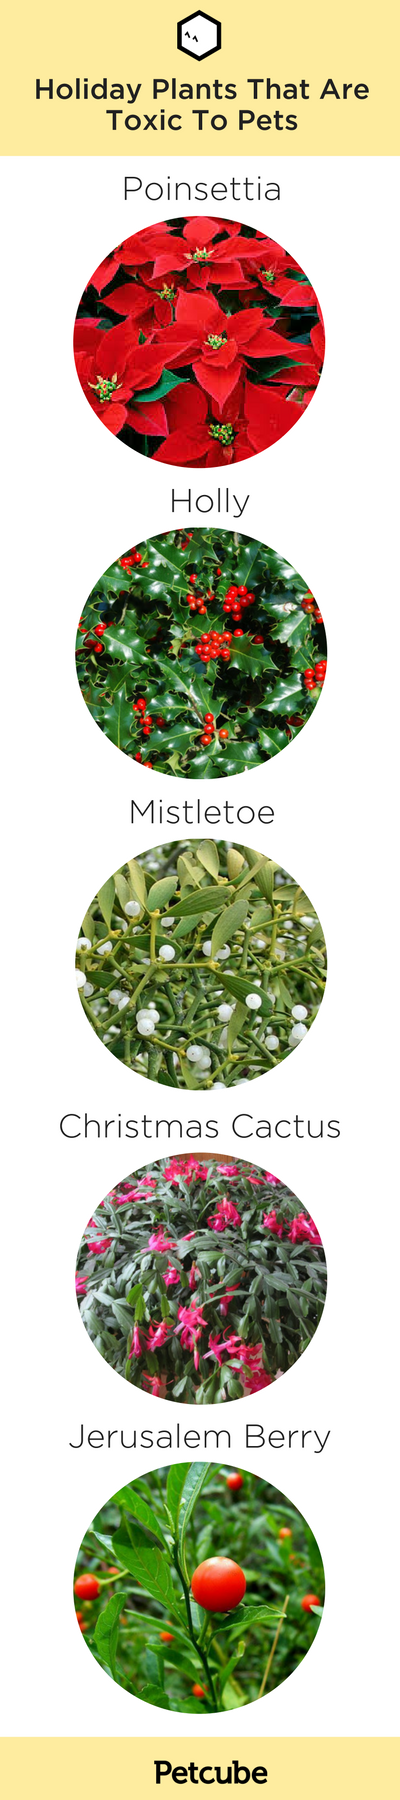 Holiday Plants Poisonous To Pets Poinsettias, Cactus